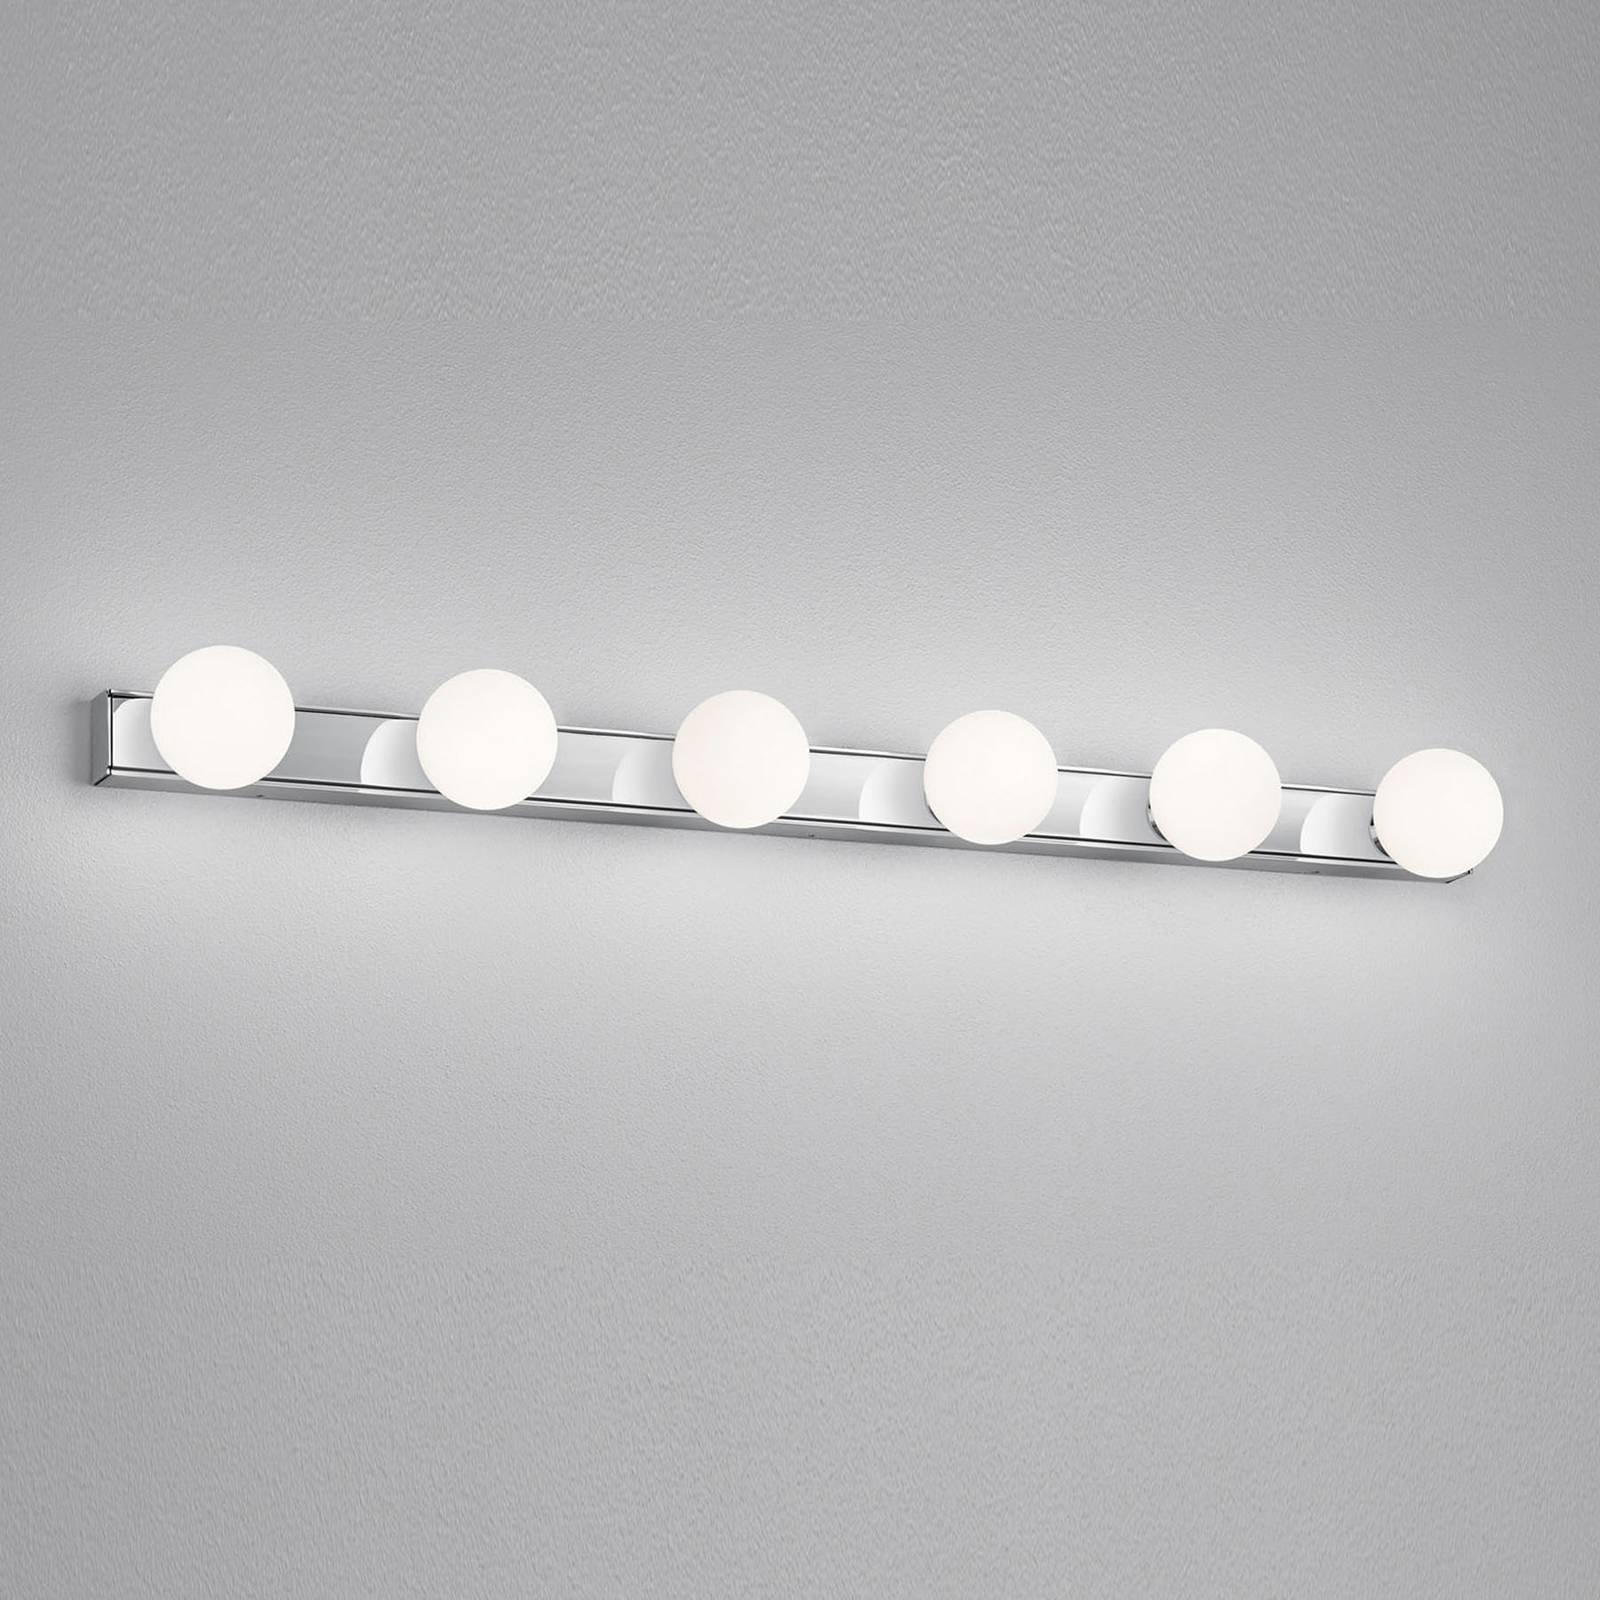 Helestra Lis LED-speillampe, 6 lyskilder